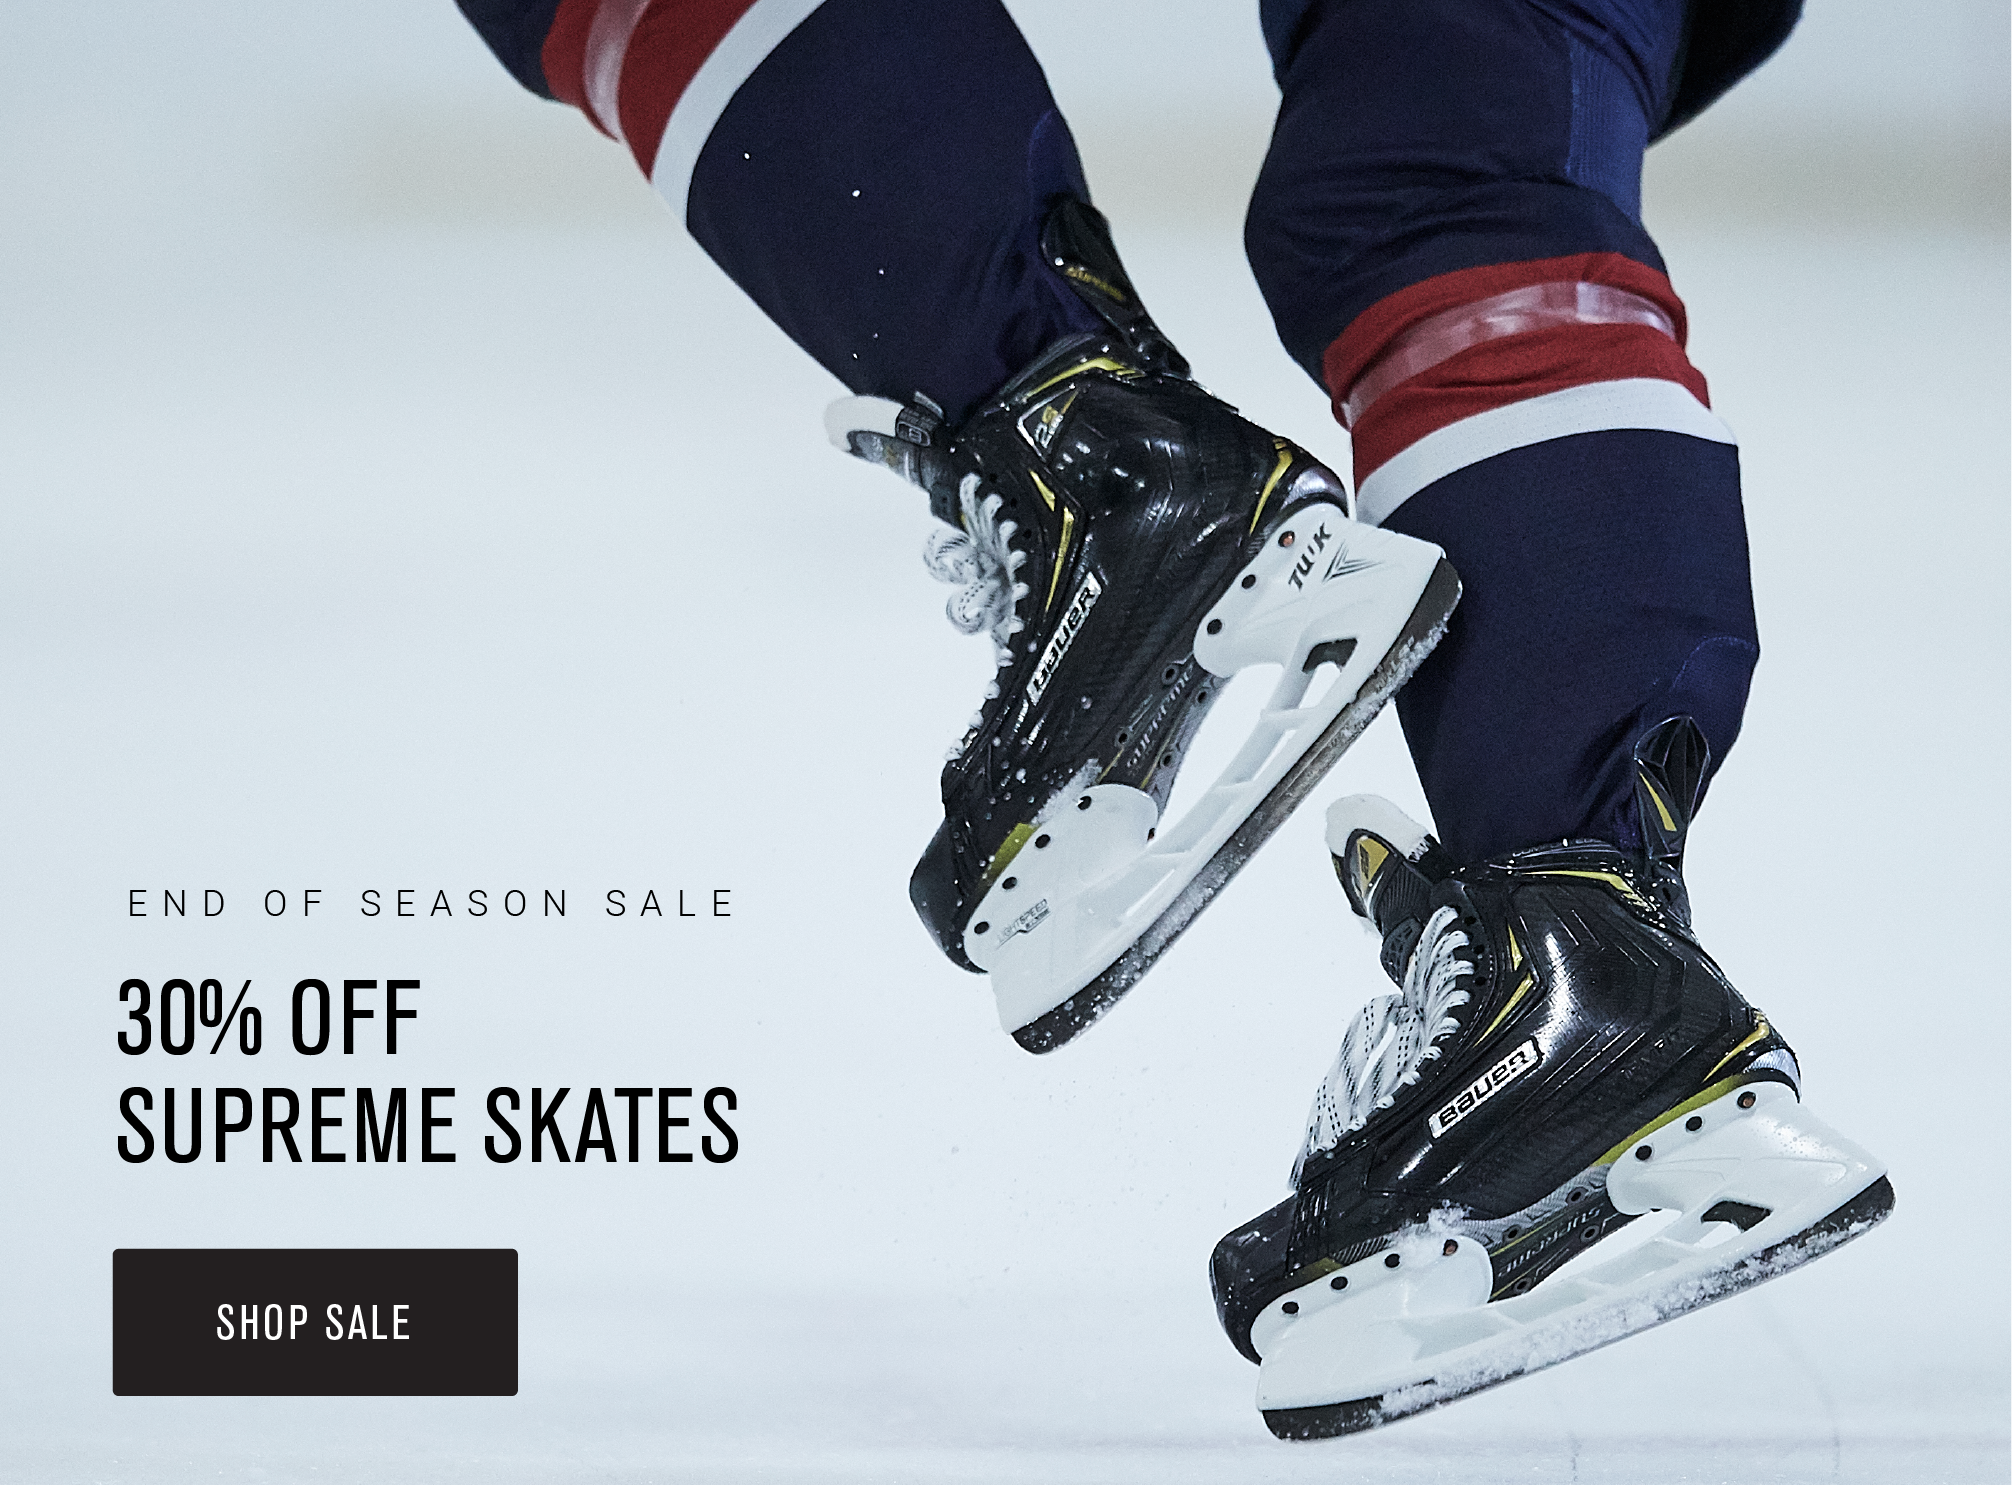 30% off Supreme Skates